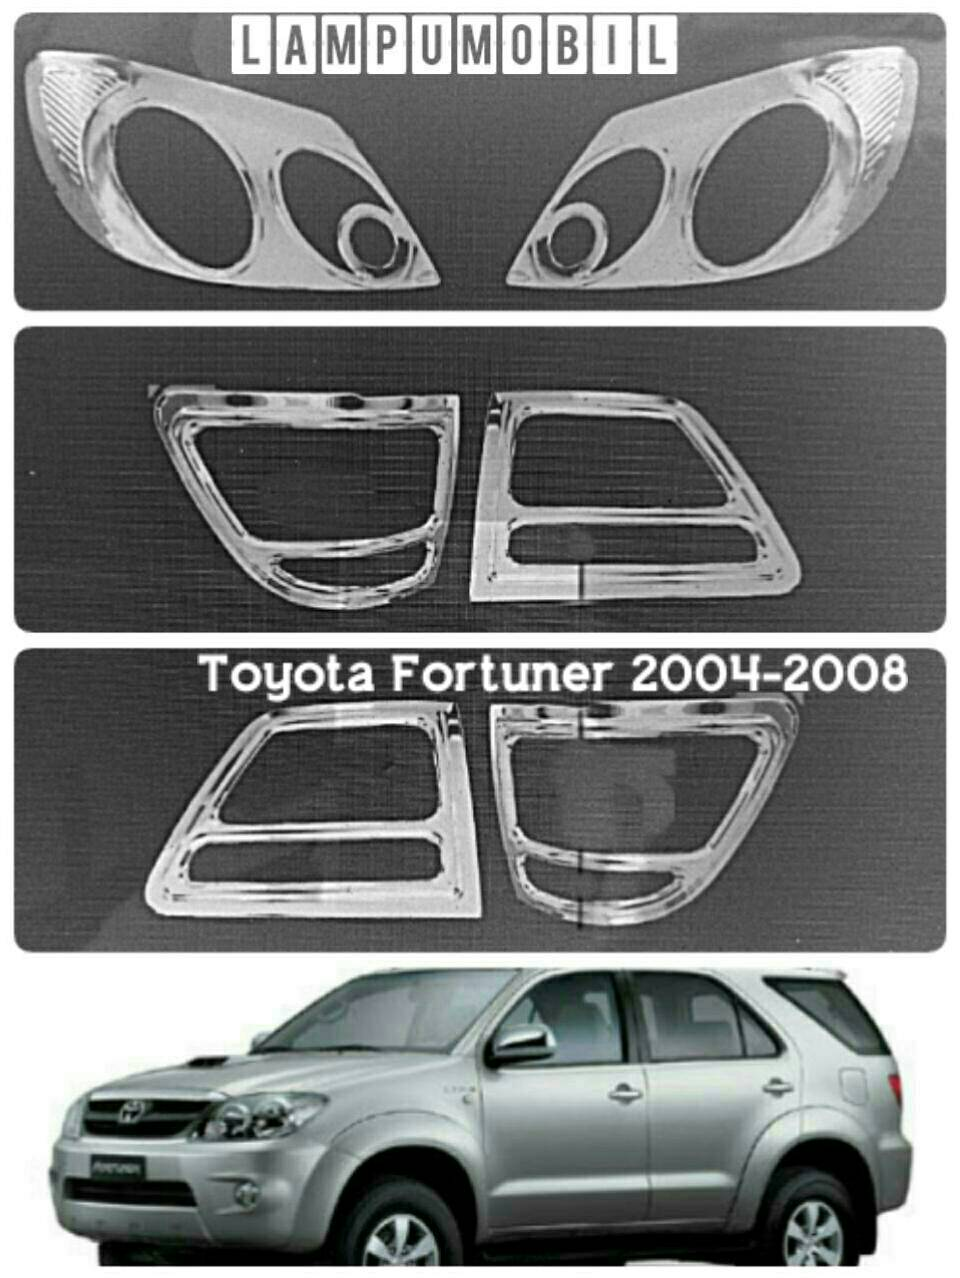 Garnish Lampu Set Toyota Fortuner 2004-2008 ( 6 pcs)